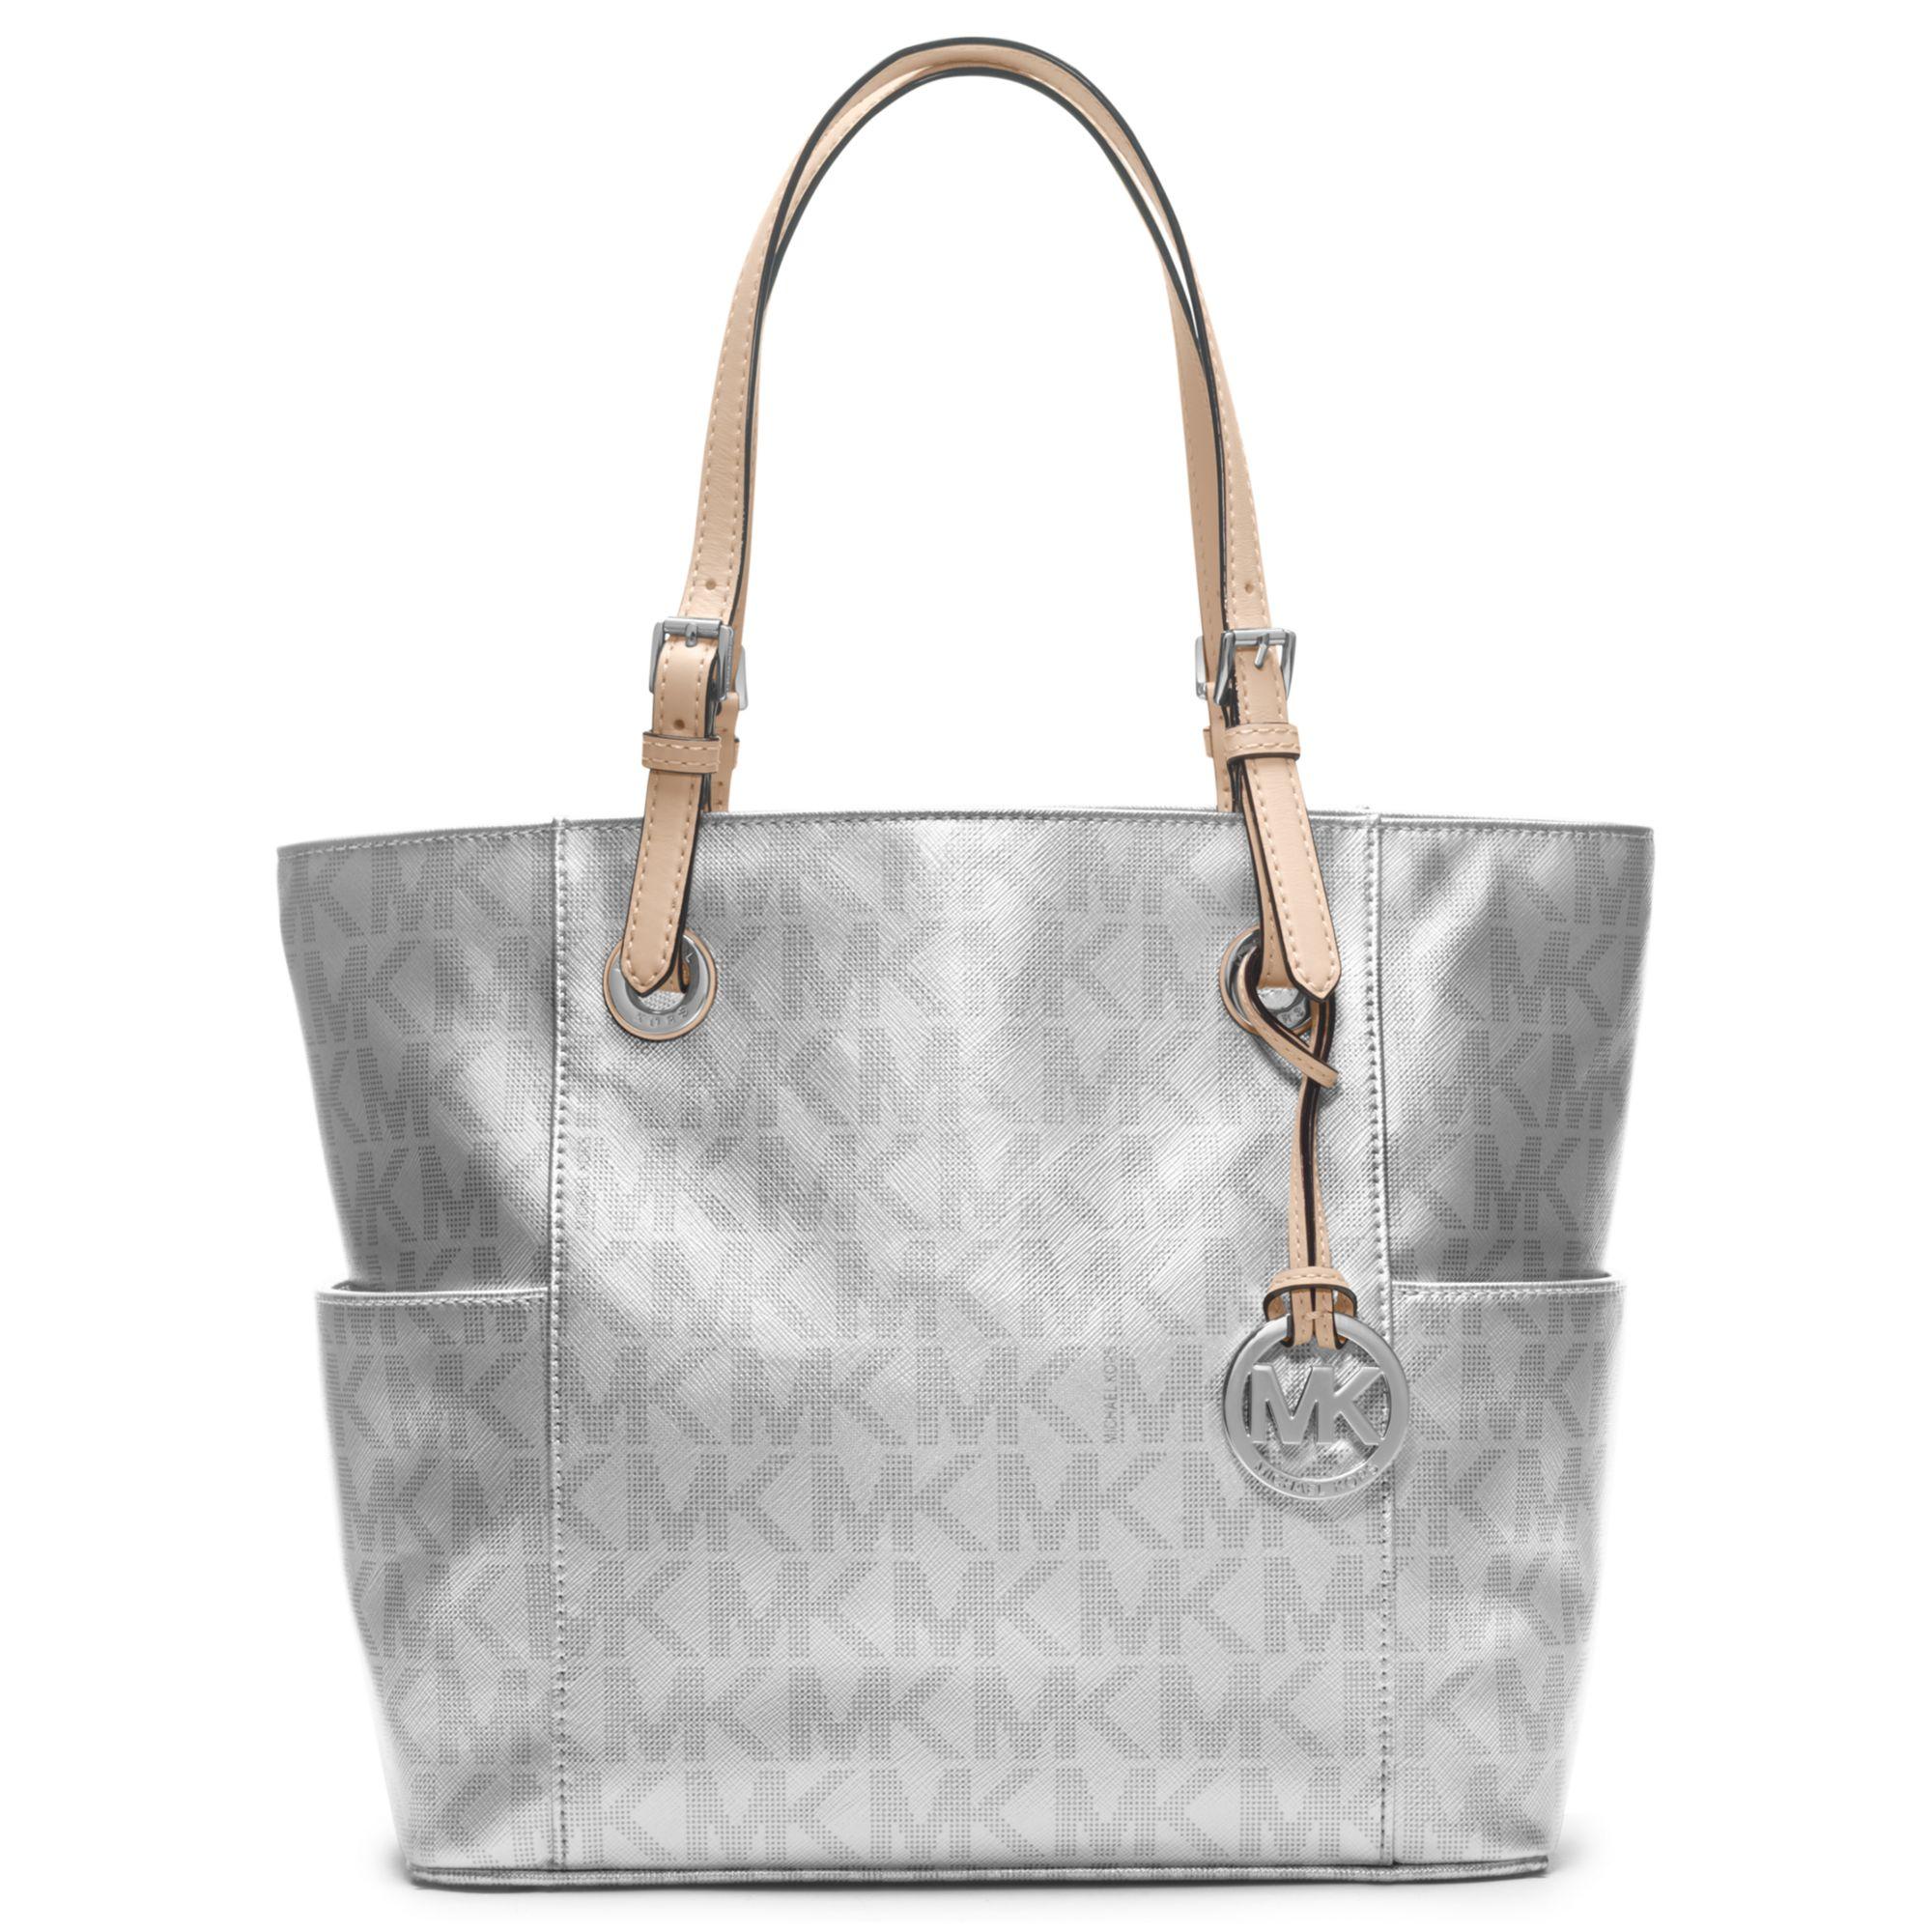 michael kors silver monogram handbags